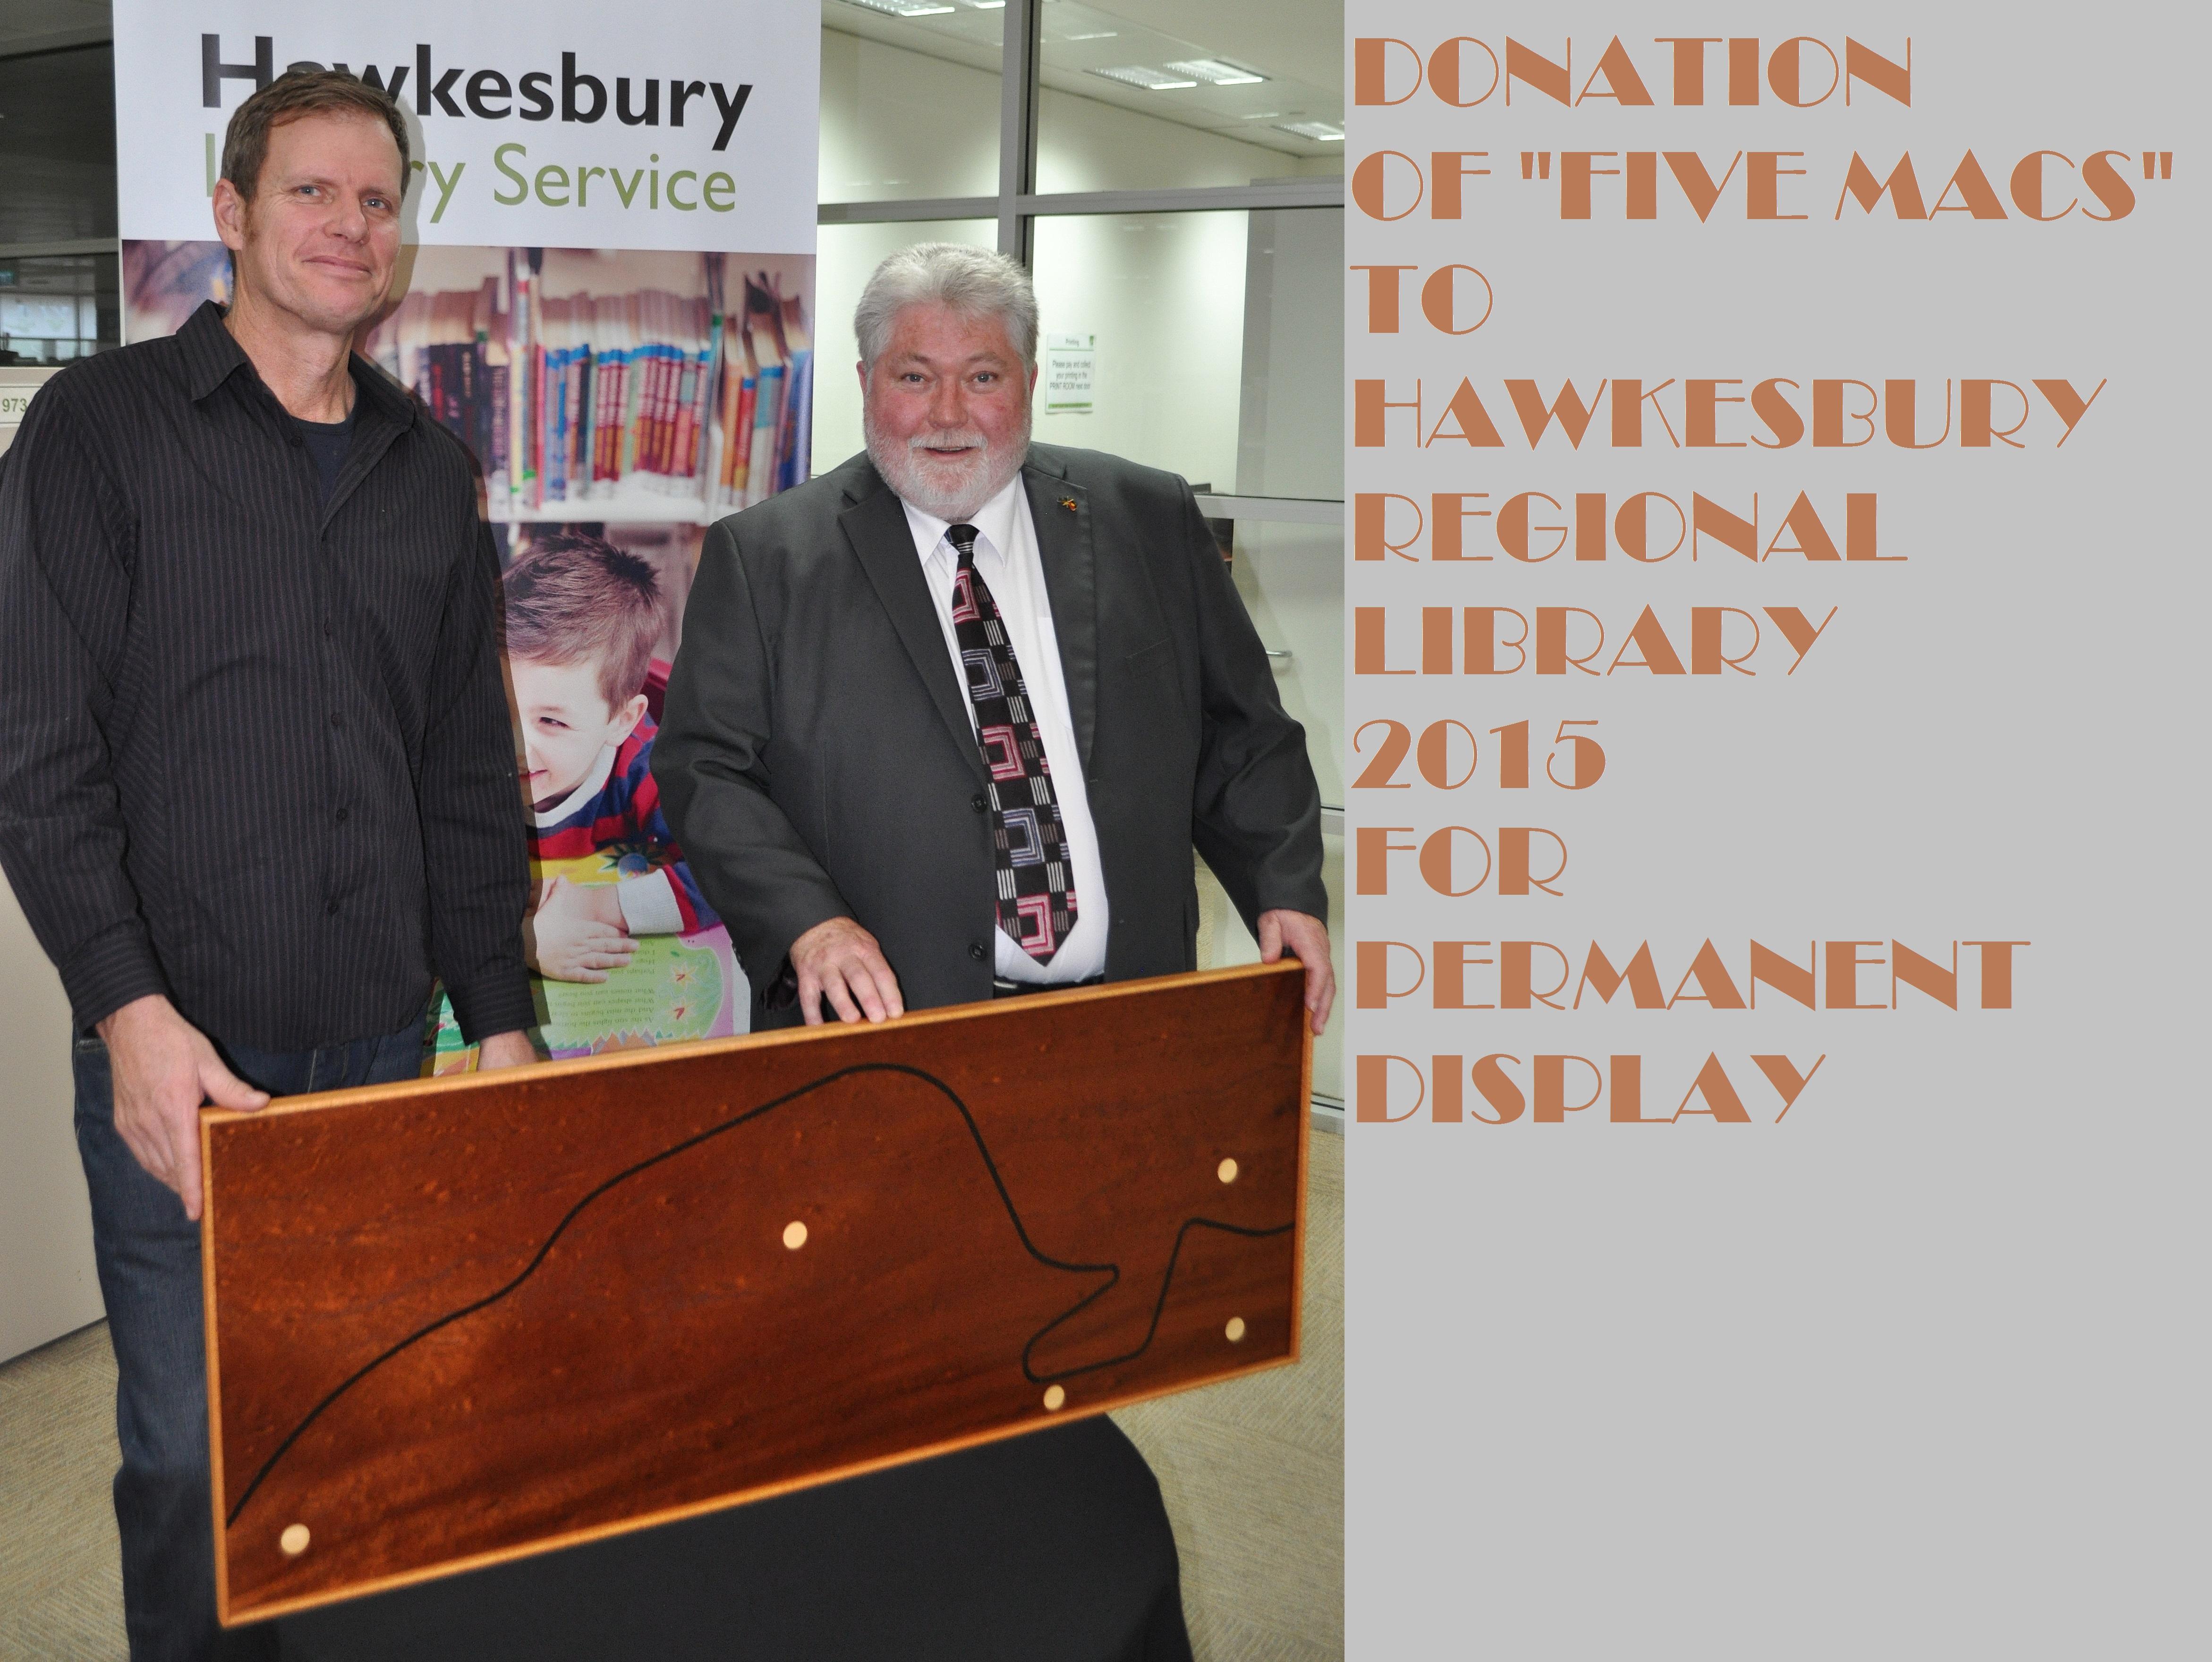 Hawkesbury Library